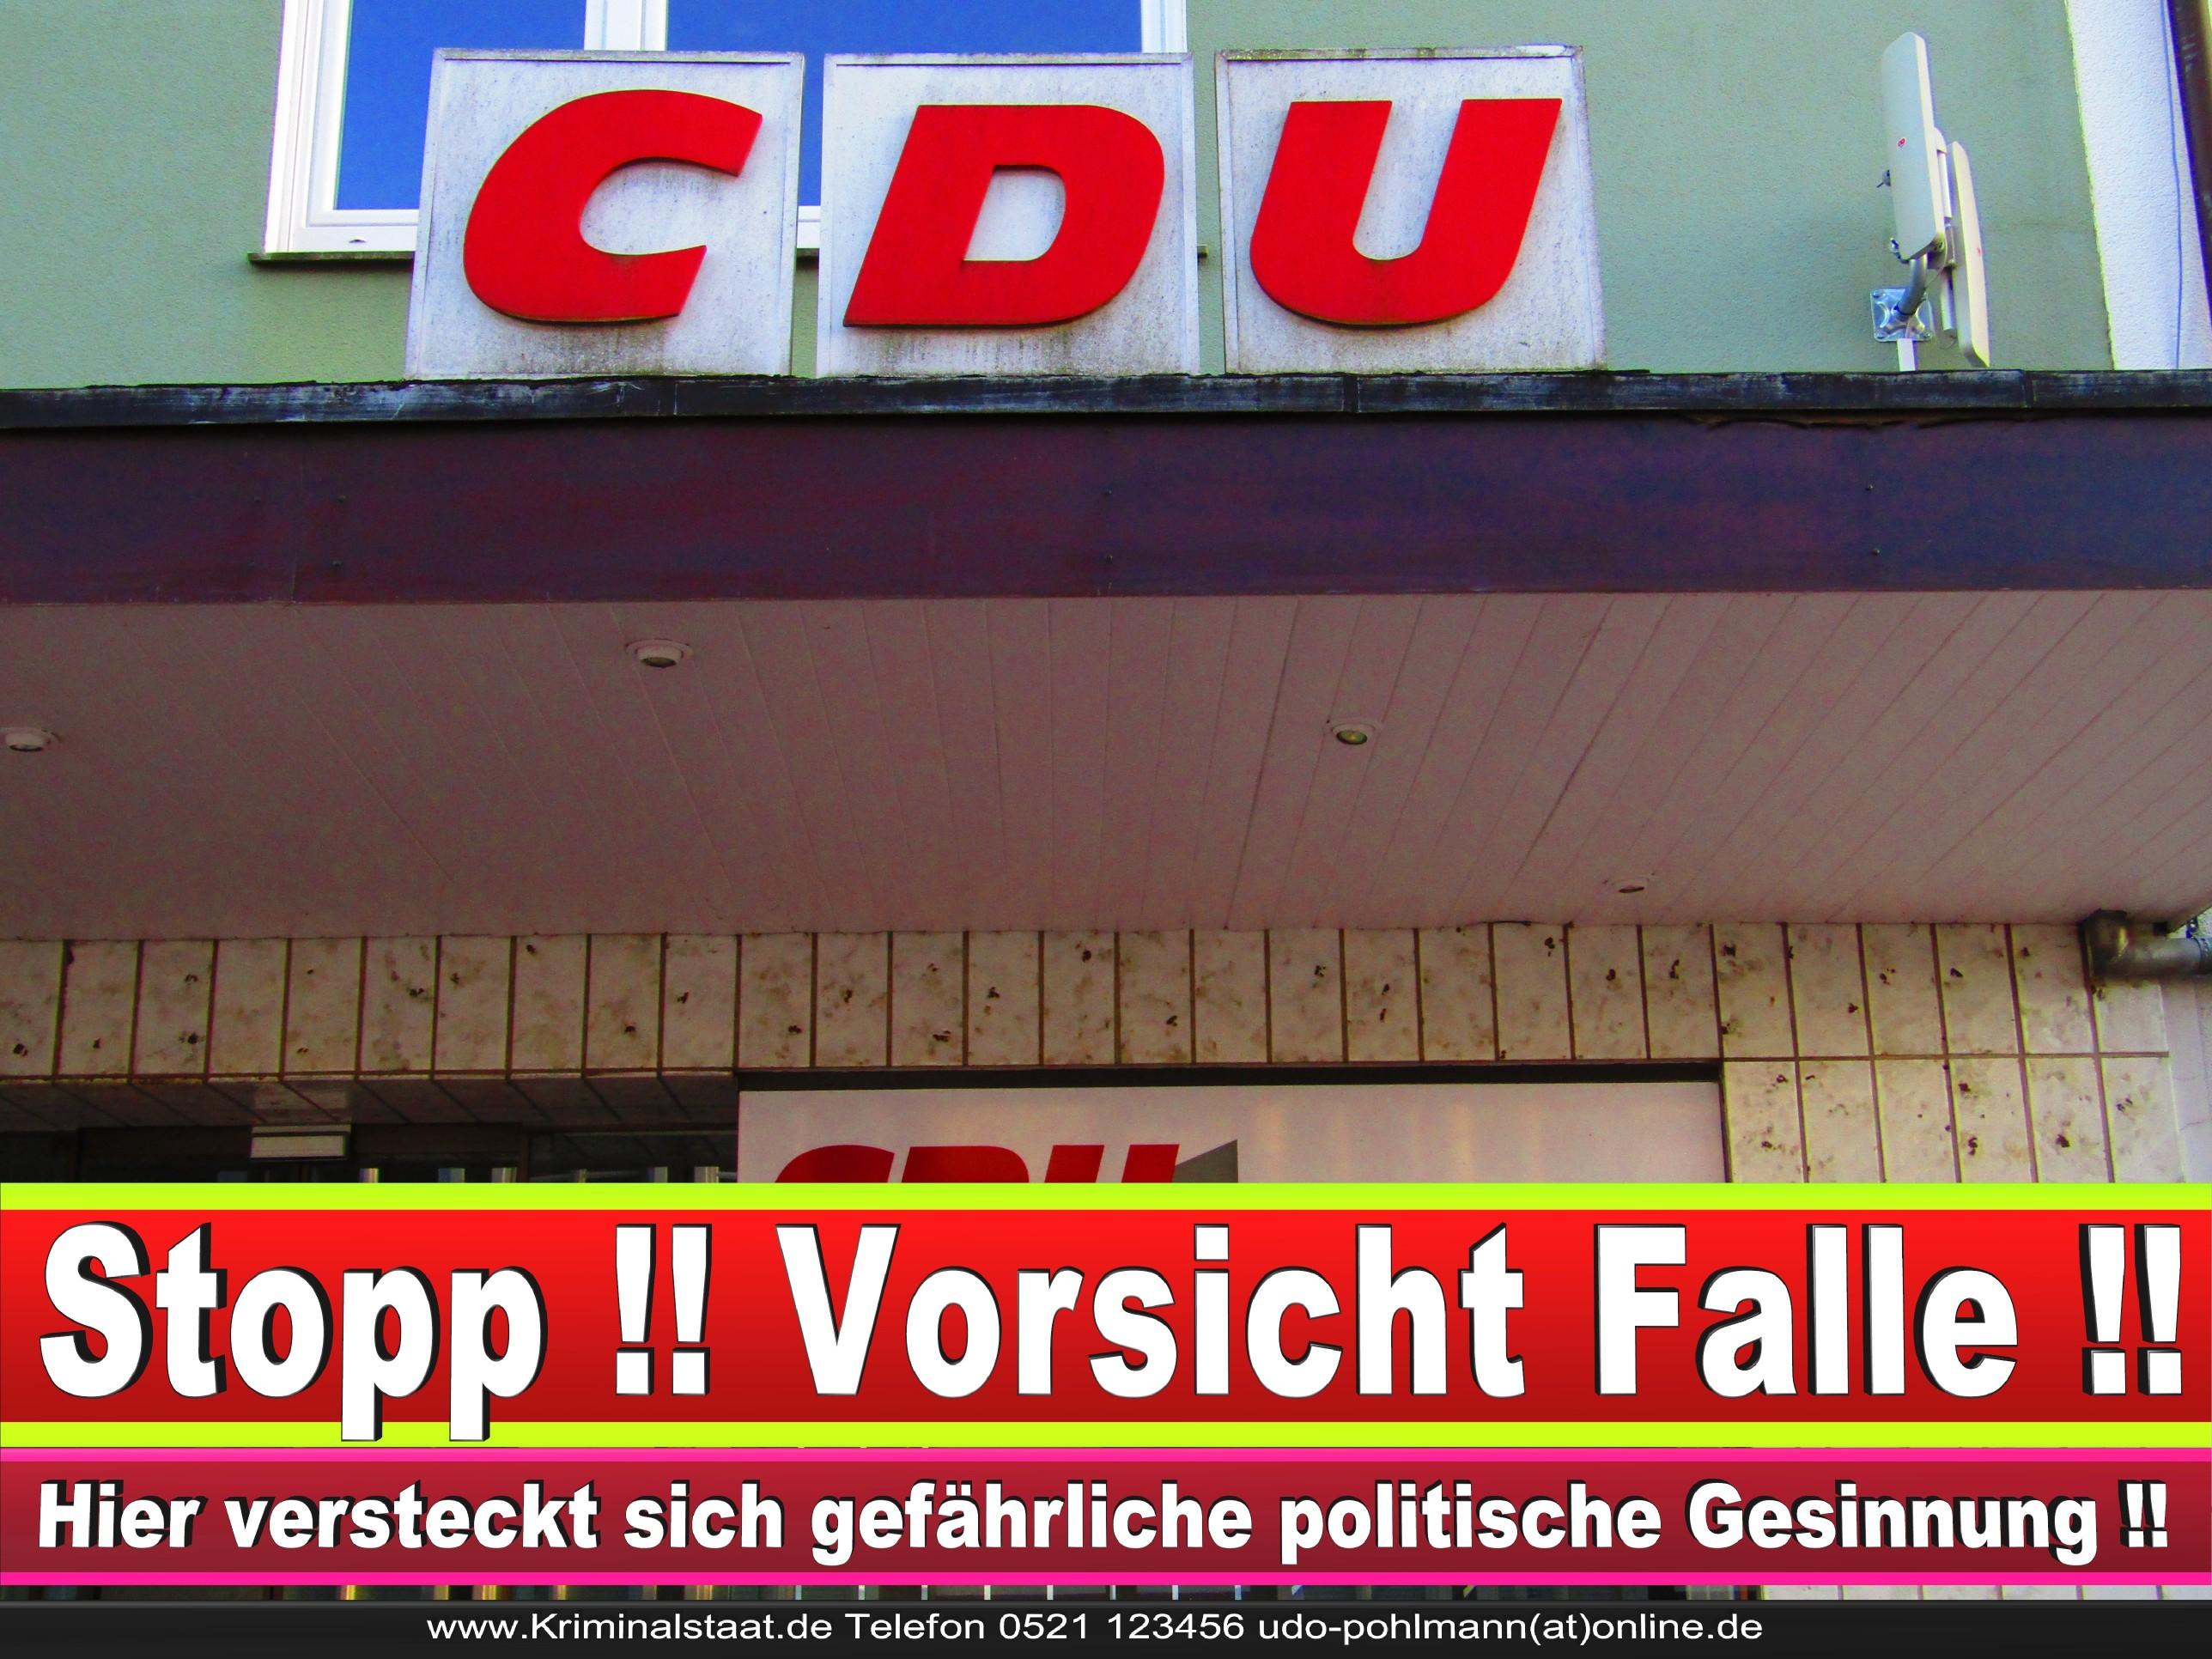 Rathaus Steinhagen CDU SPD FDP Ortsverband CDU Bürgerbüro CDU SPD Korruption Polizei Bürgermeister Karte Telefonbuch NRW OWL (4)